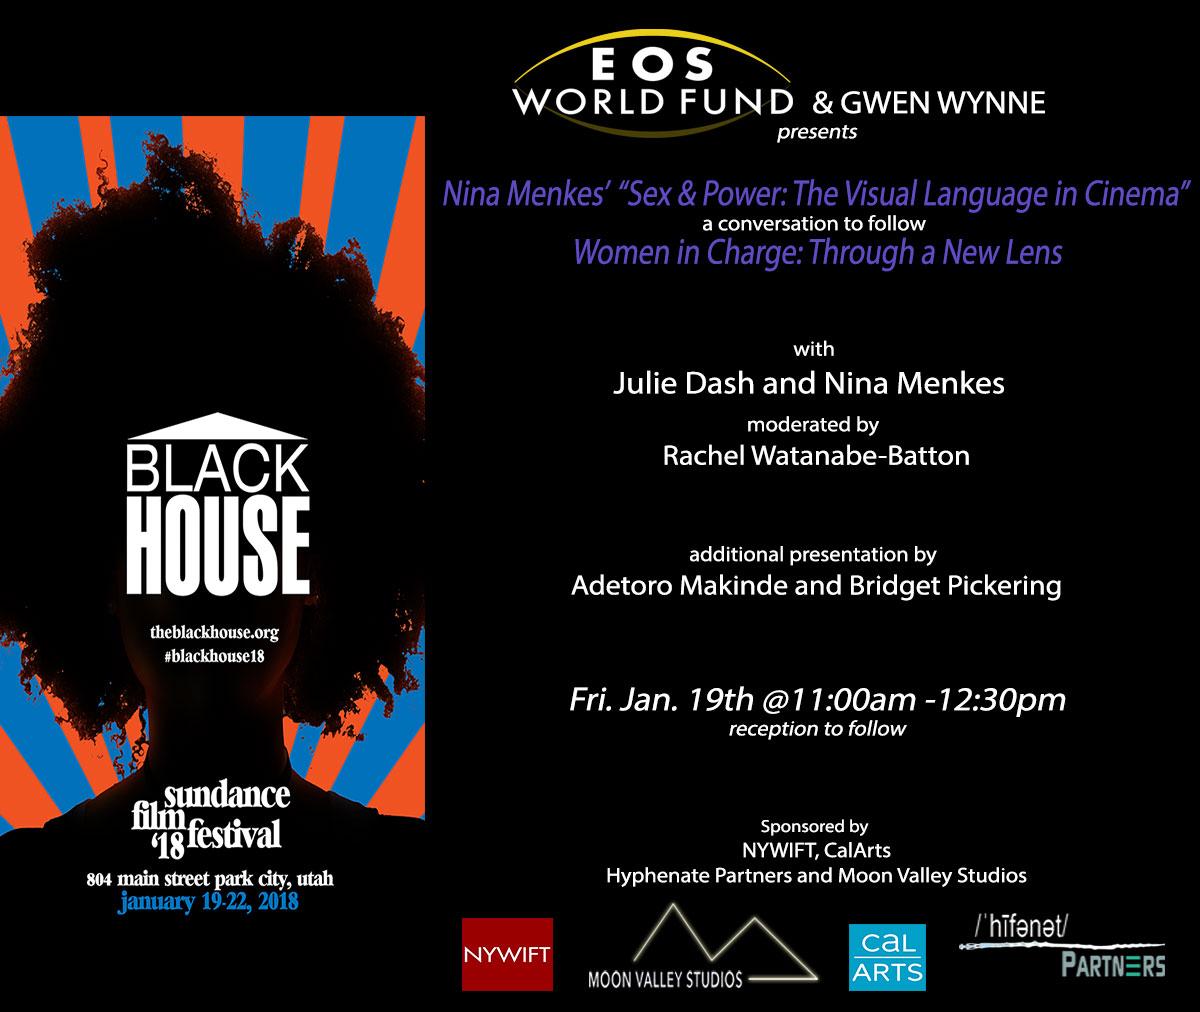 Blackhouse-EOS-Panel_-FINAL_logo